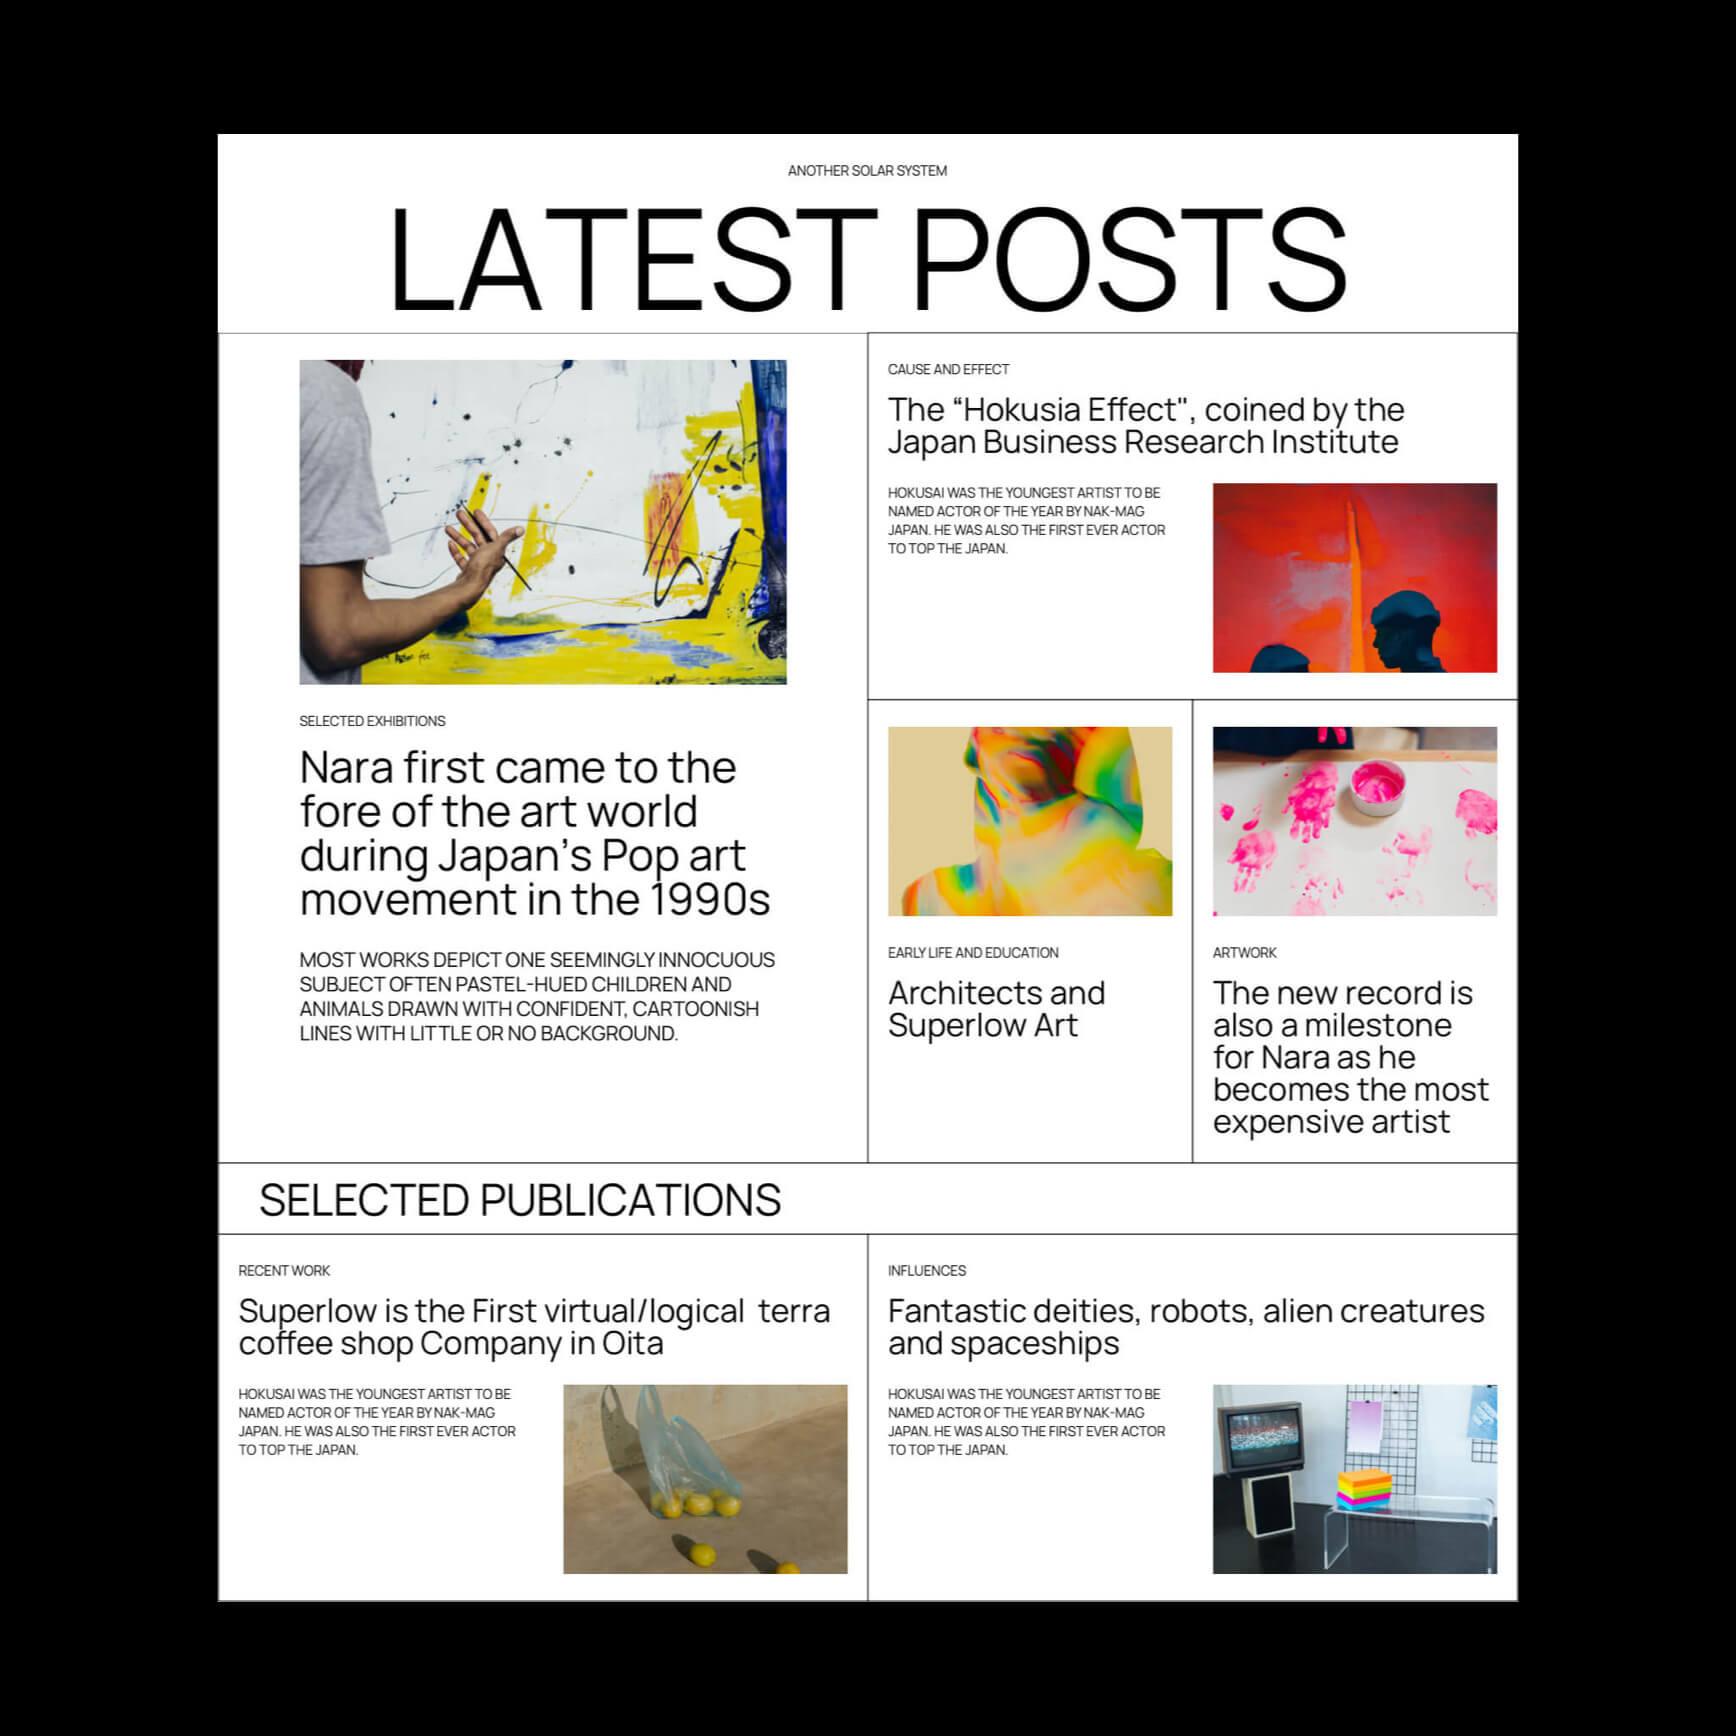 Latest posts block pattern